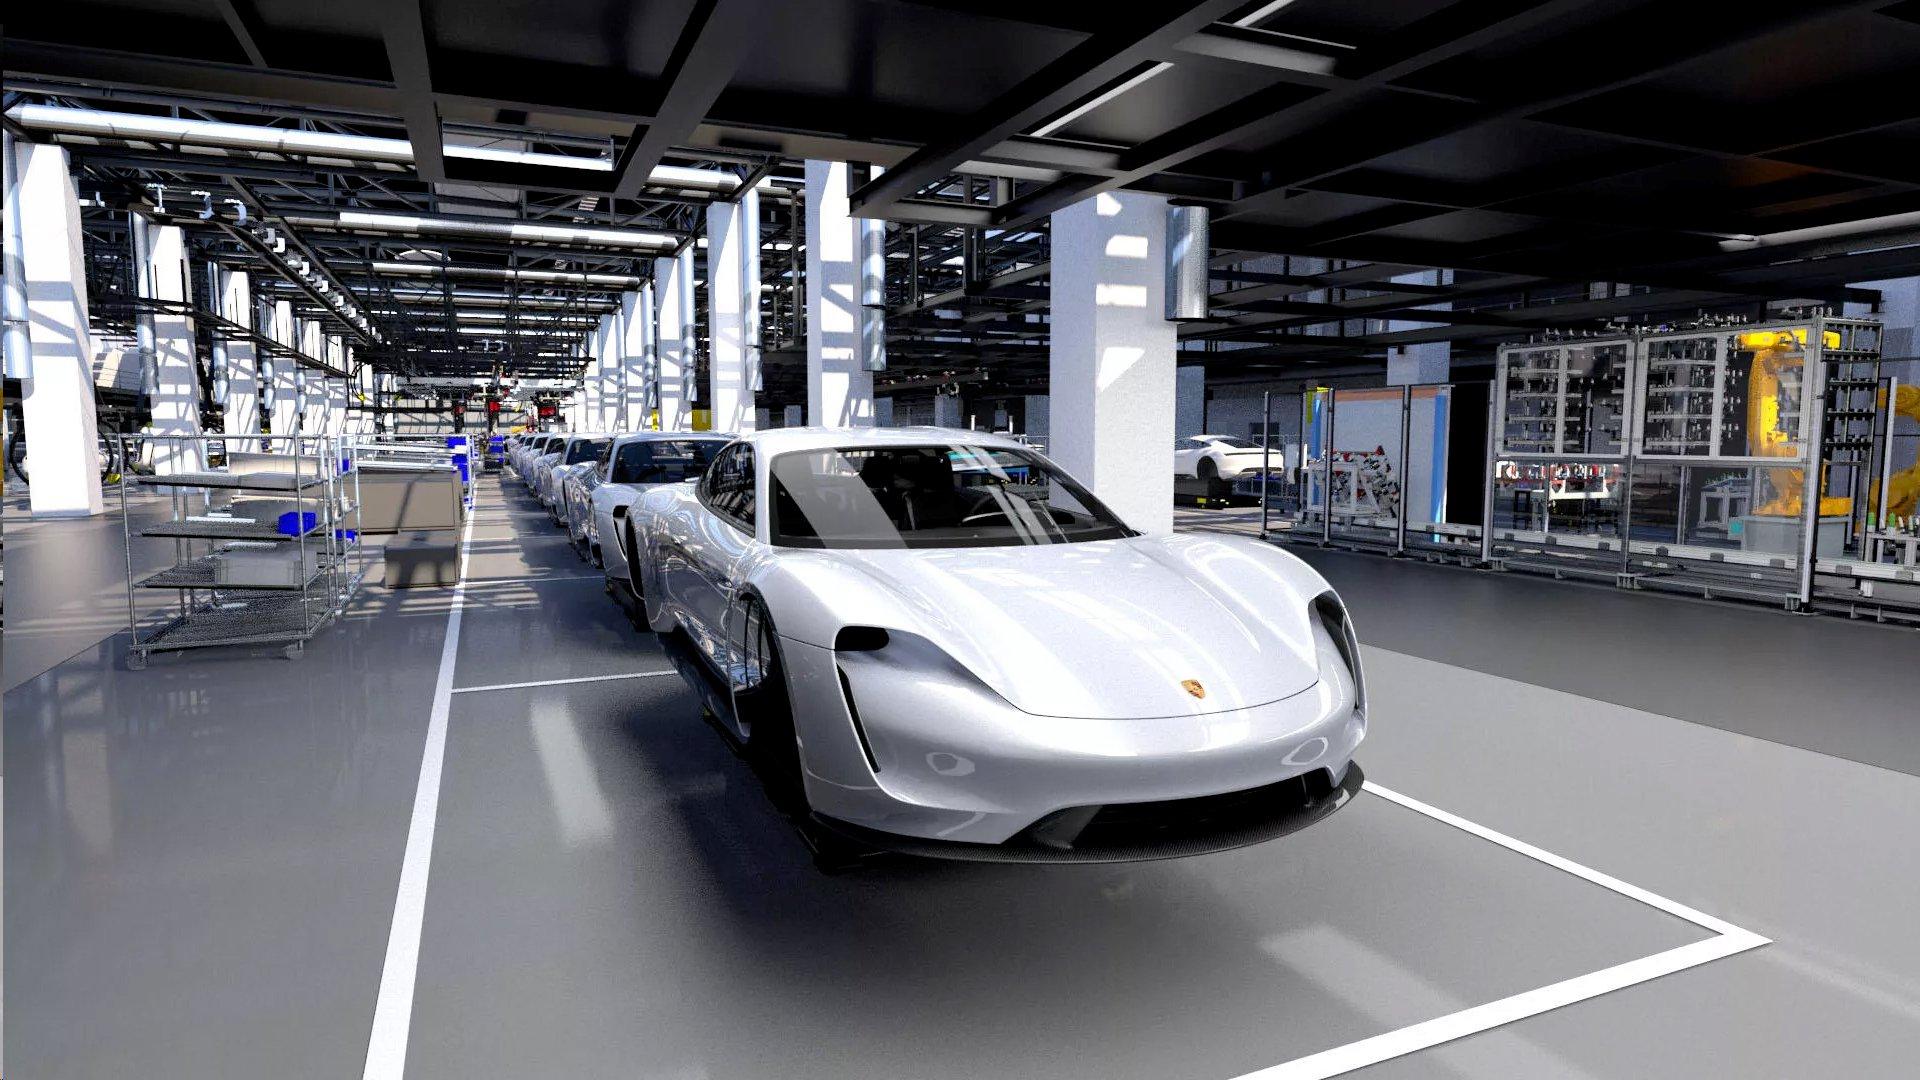 Porsche Taycan cenovno između Cayennea i Panamere